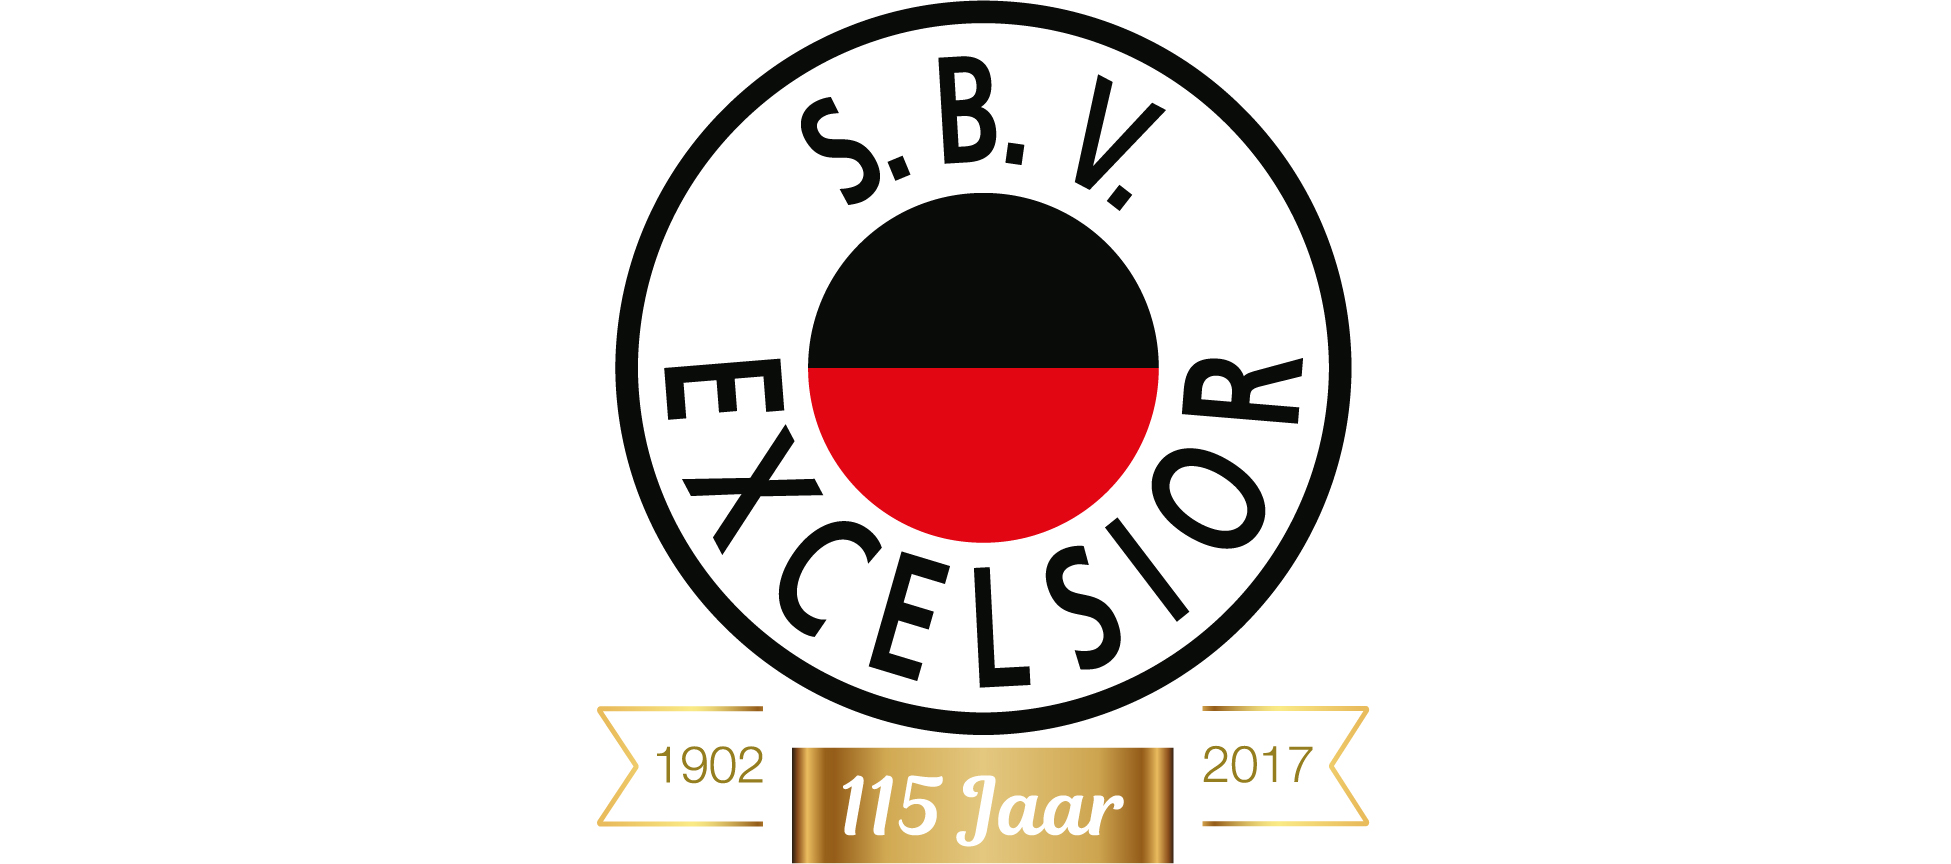 Excelsior (115 jaar)